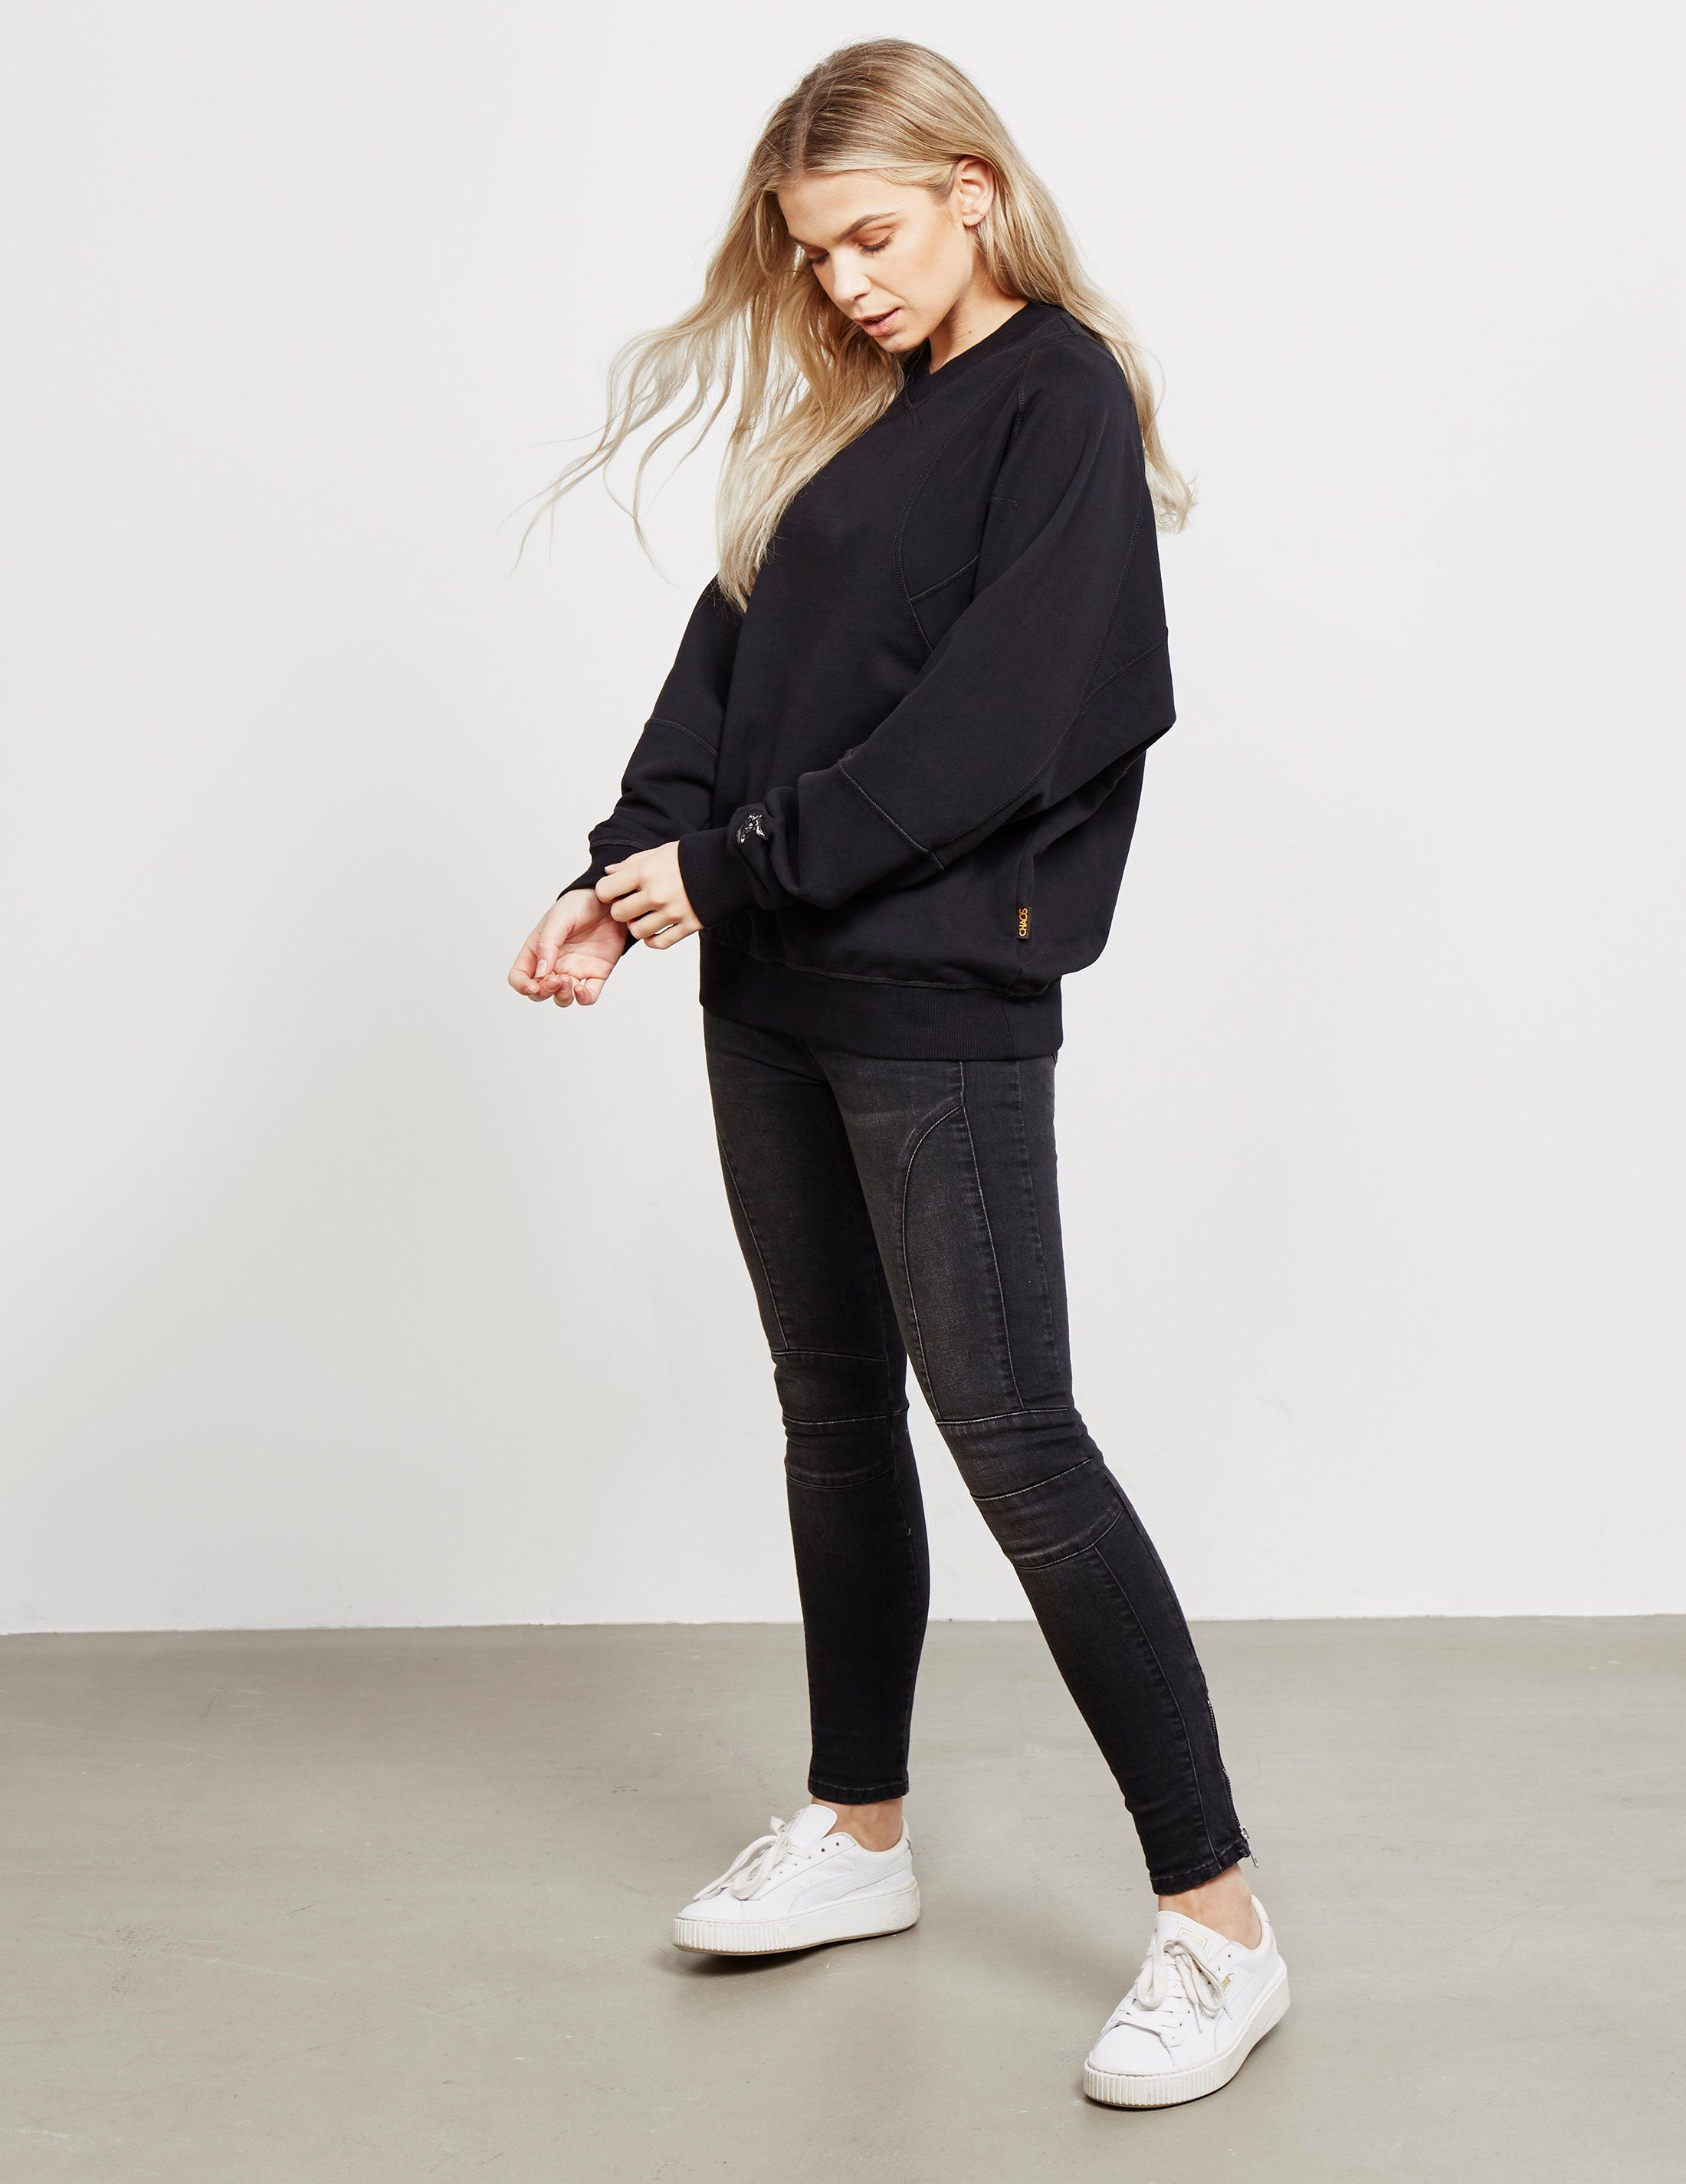 Vivienne Westwood Oversized Sweatshirt